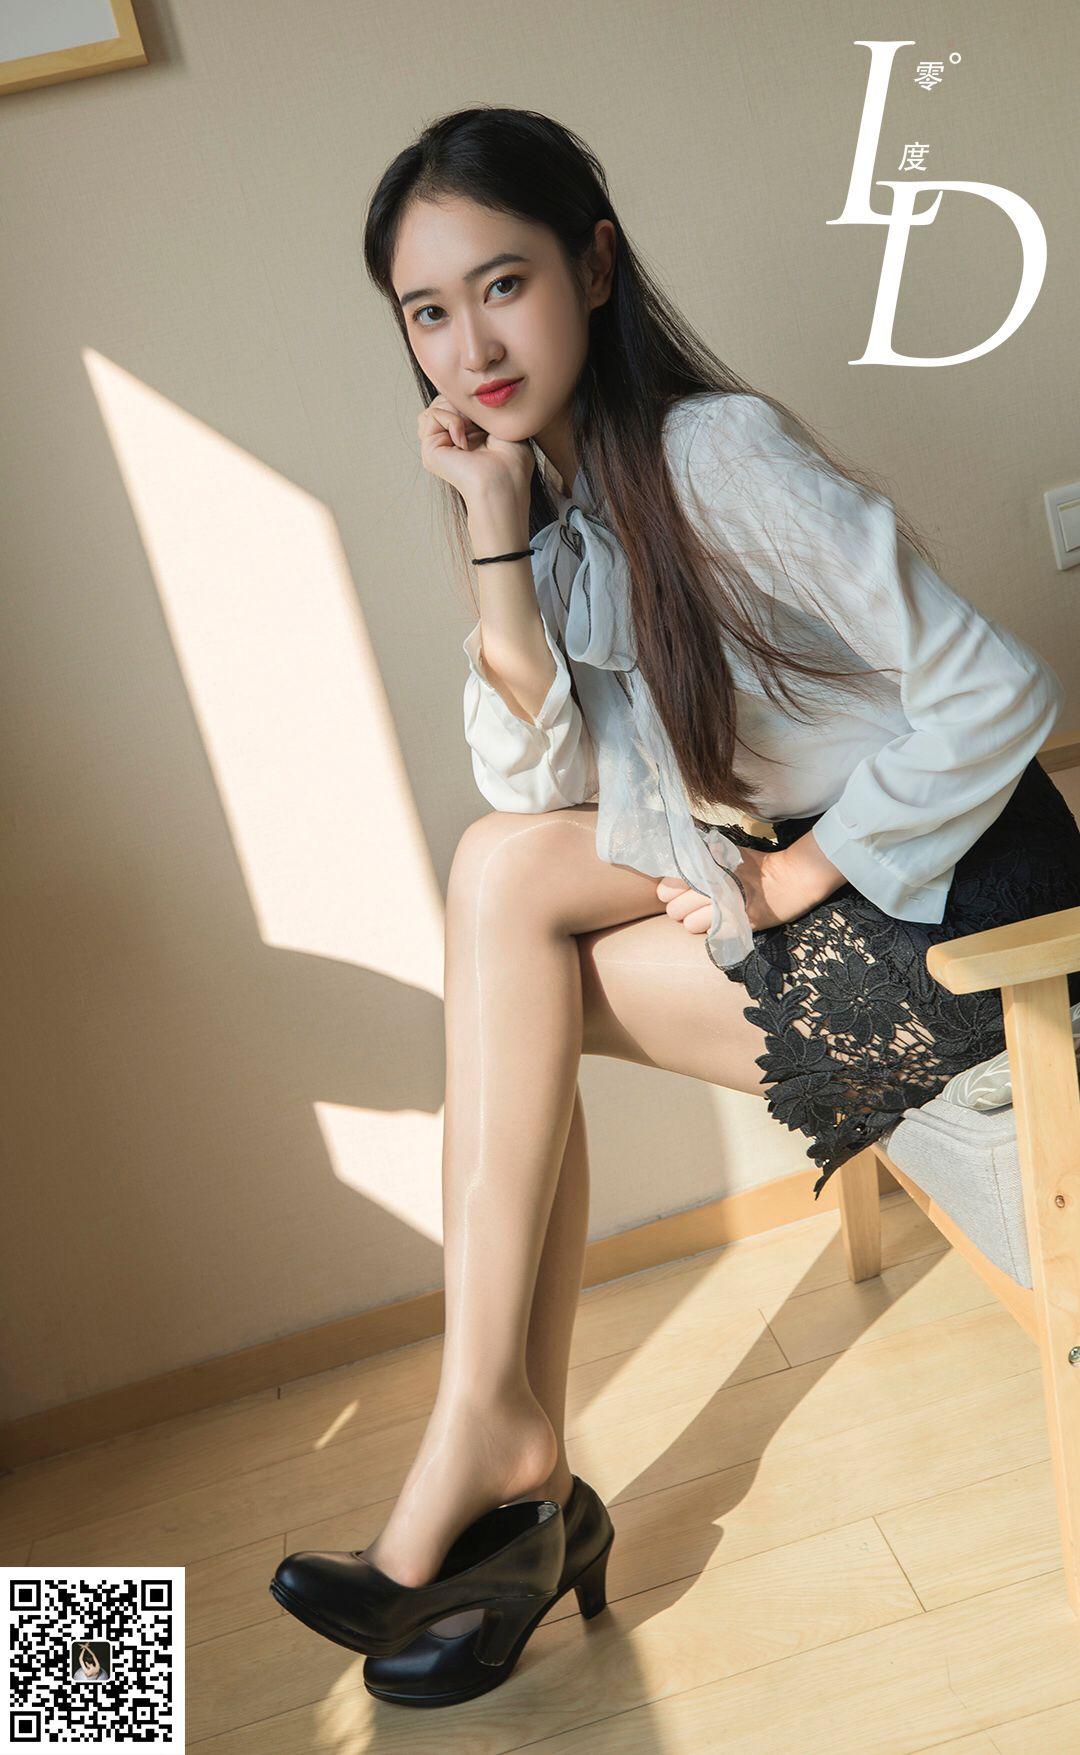 VOL.32 [LD零度]丝袜女郎:一含高品质写真套图(72P)